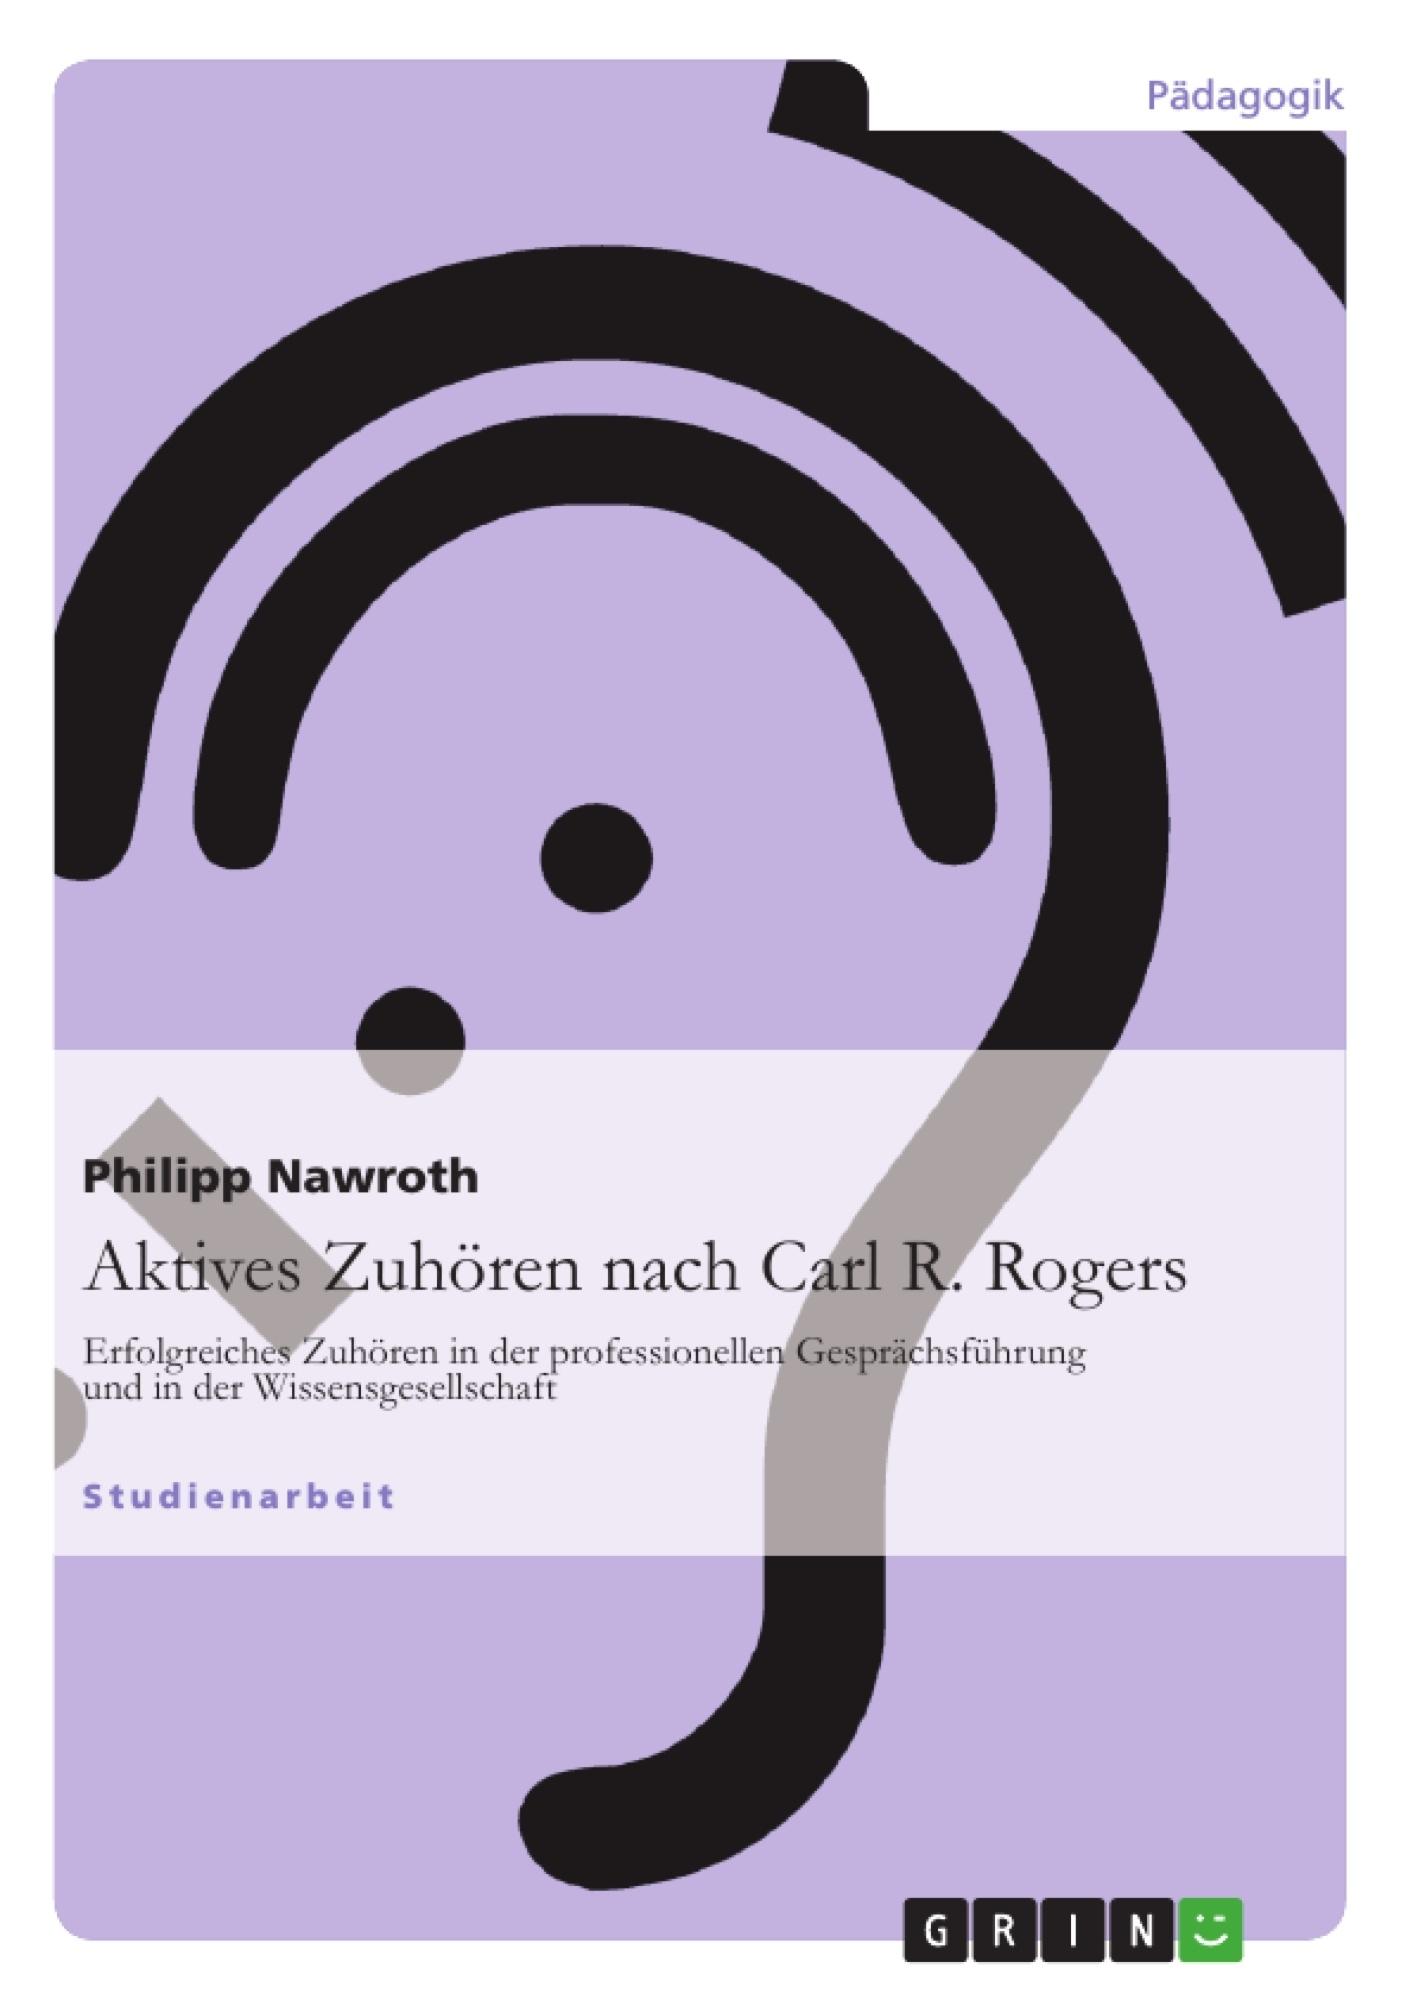 Titel: Aktives Zuhören nach Carl R. Rogers